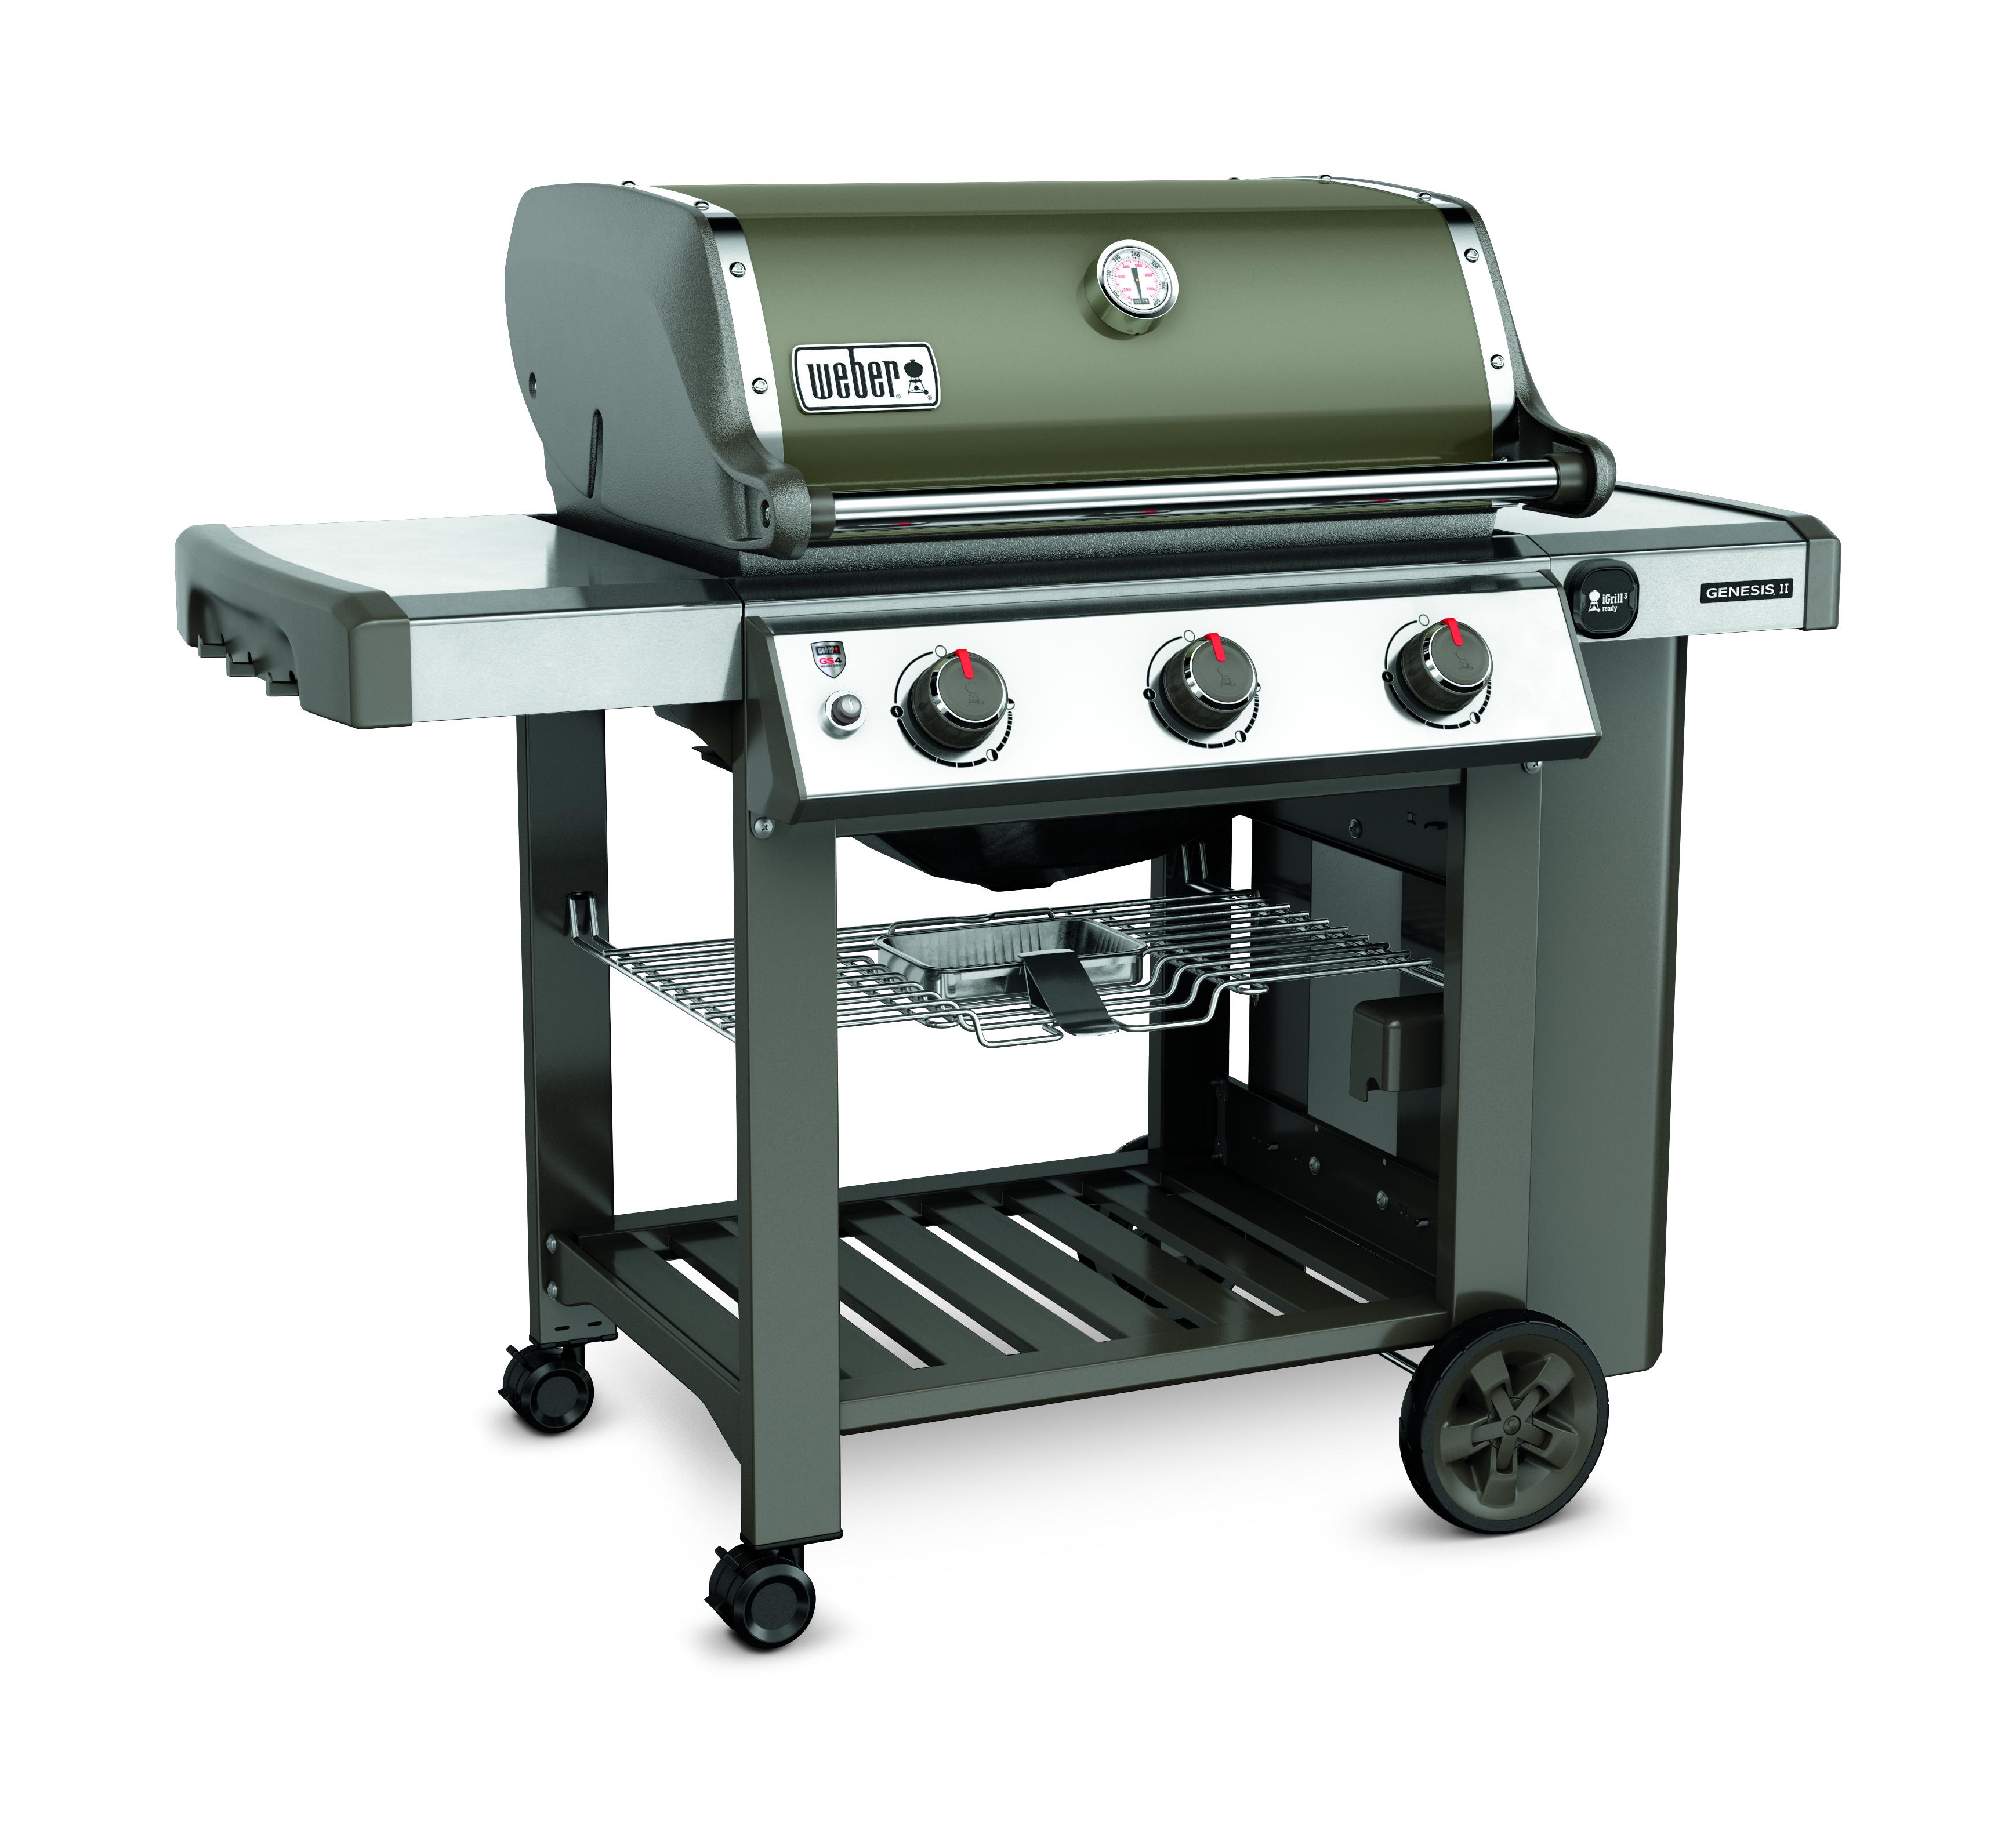 barbecue americain weber genesis ii e-310 gbs smoke grey - 61050153